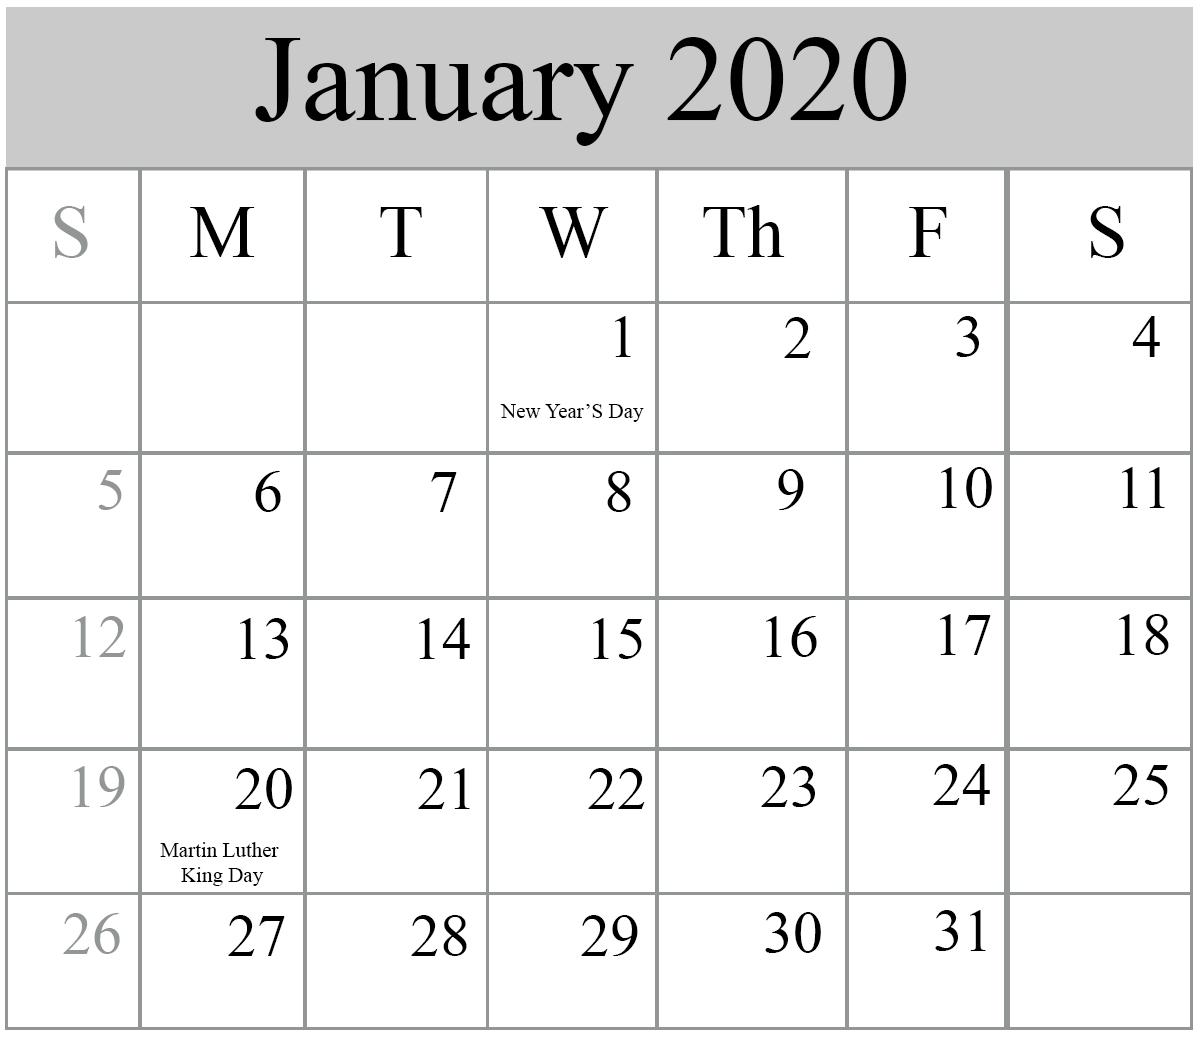 Sri Lanka 2020 Calendar 2020 Pdf-2020 January Calendar Sri Lanka